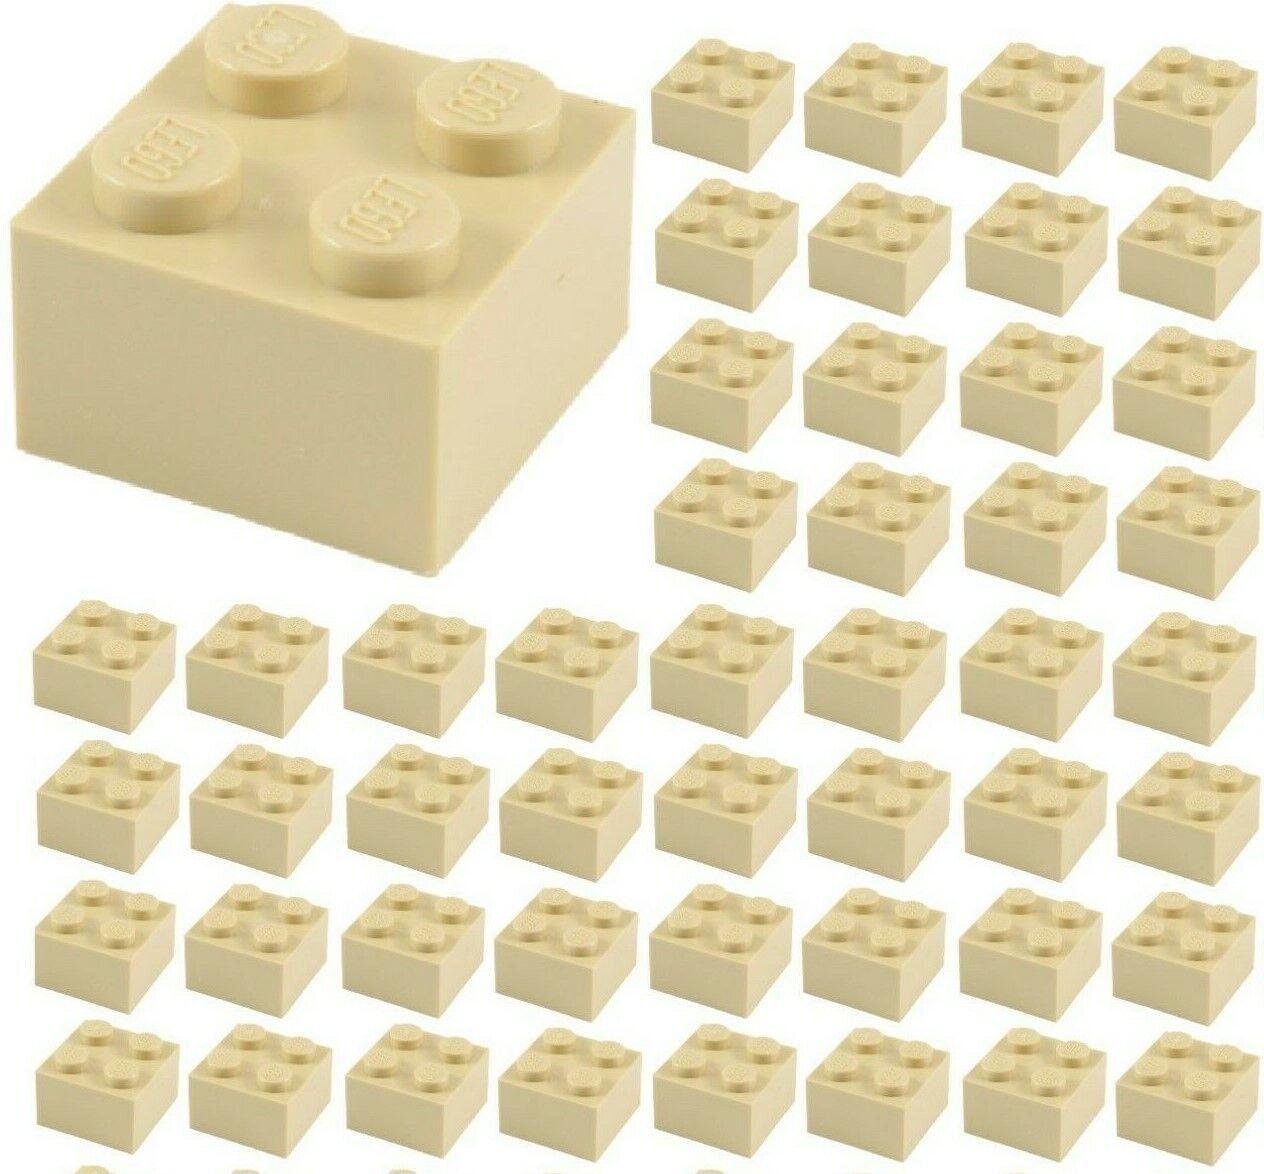 Lego 10 X Base Stone 2x2 Green Clear Transparent Green Basic Brick 3003